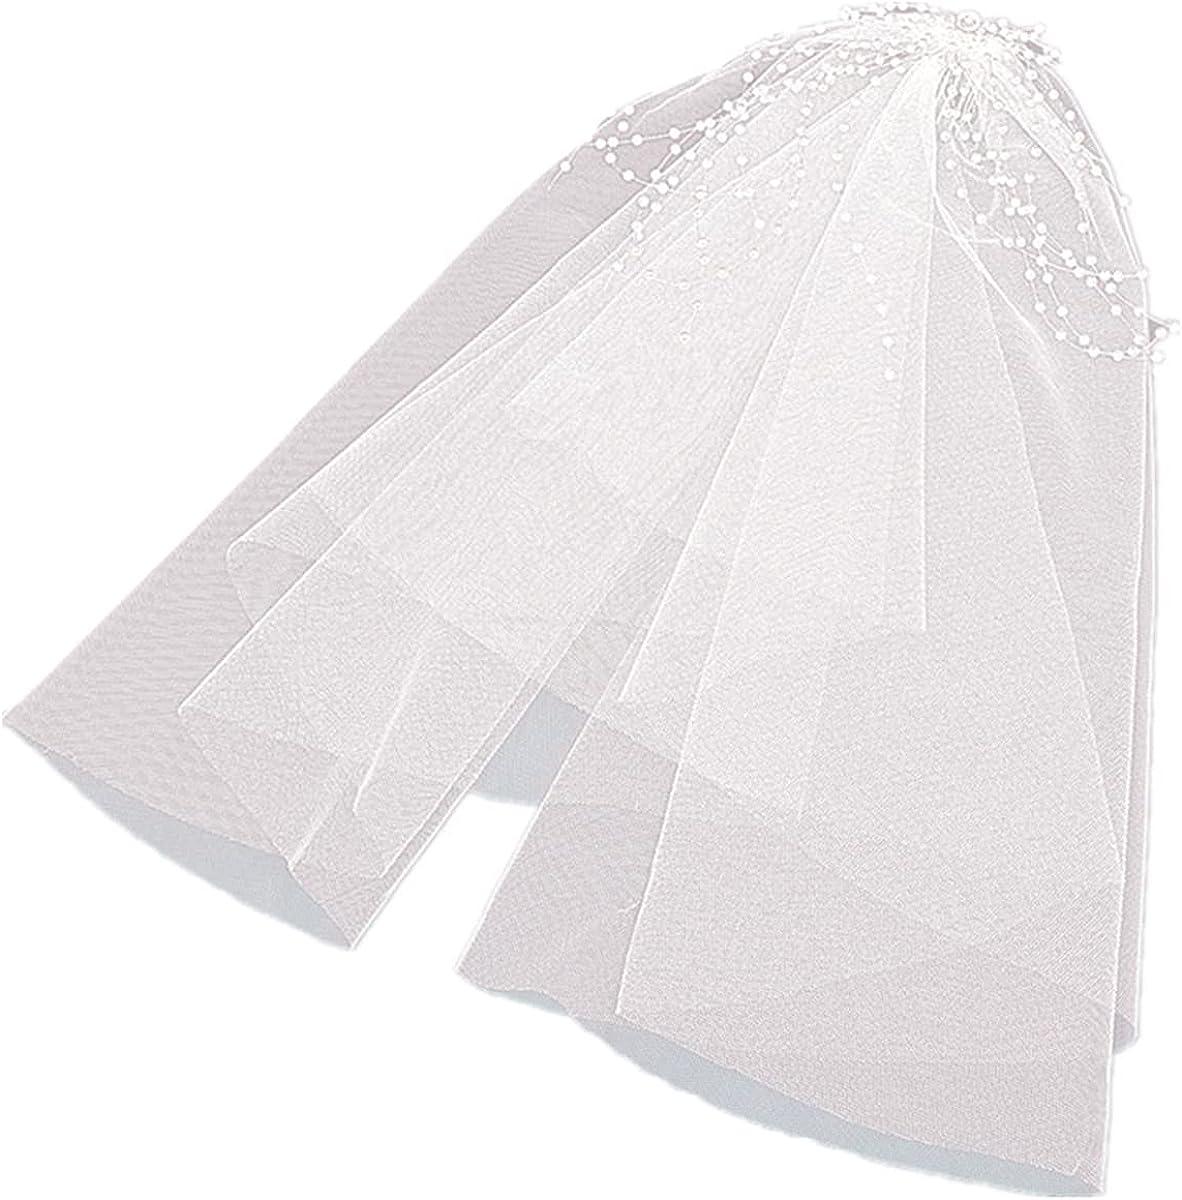 Women's Wedding Veil 1T Bridal Veil Fluffy Veil 35 CM Tulle Veil for Wedding Single Party